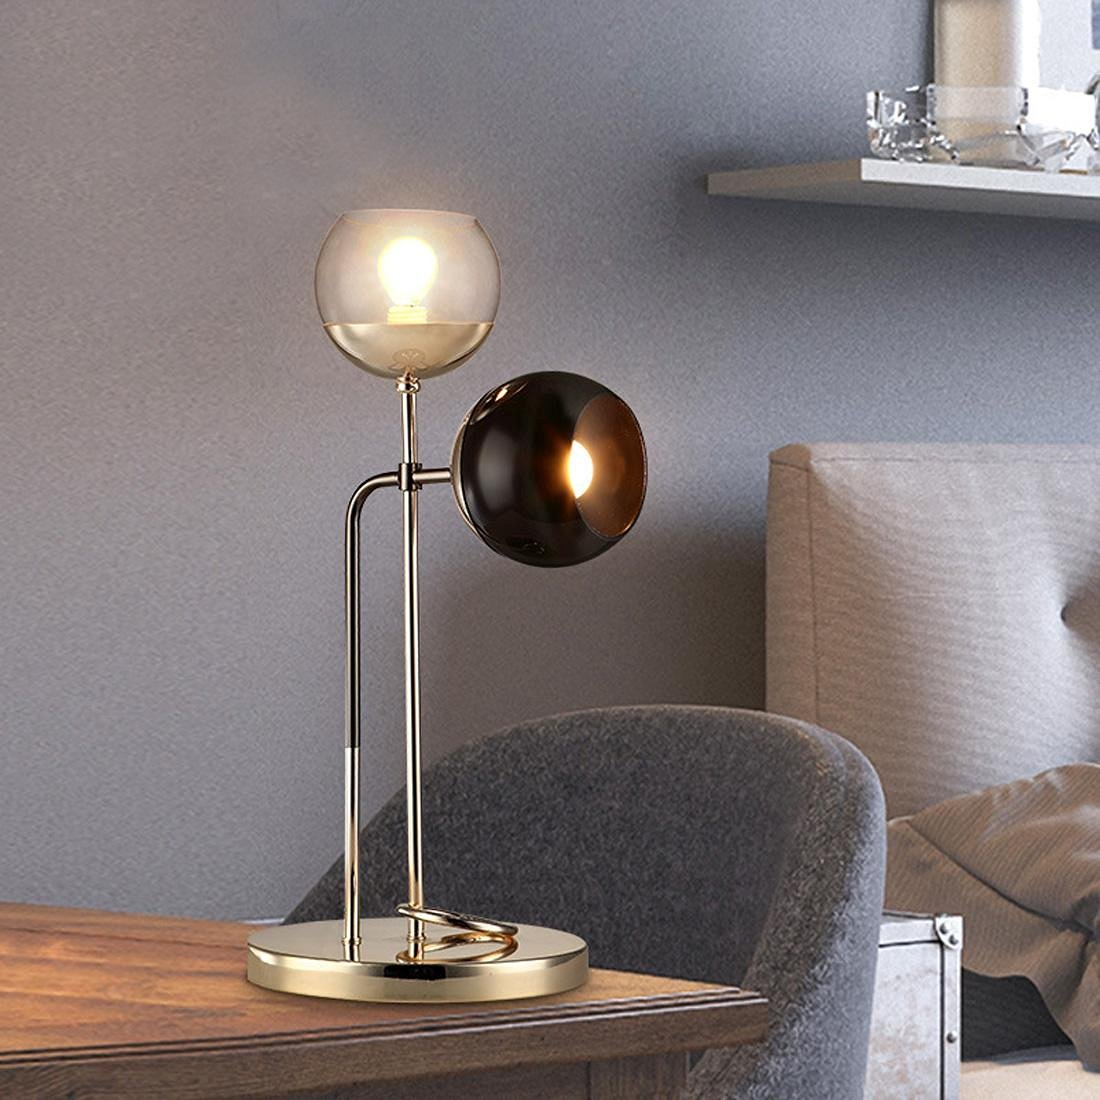 Cheap Art Studio Lamps Find Art Studio Lamps Deals On Line At